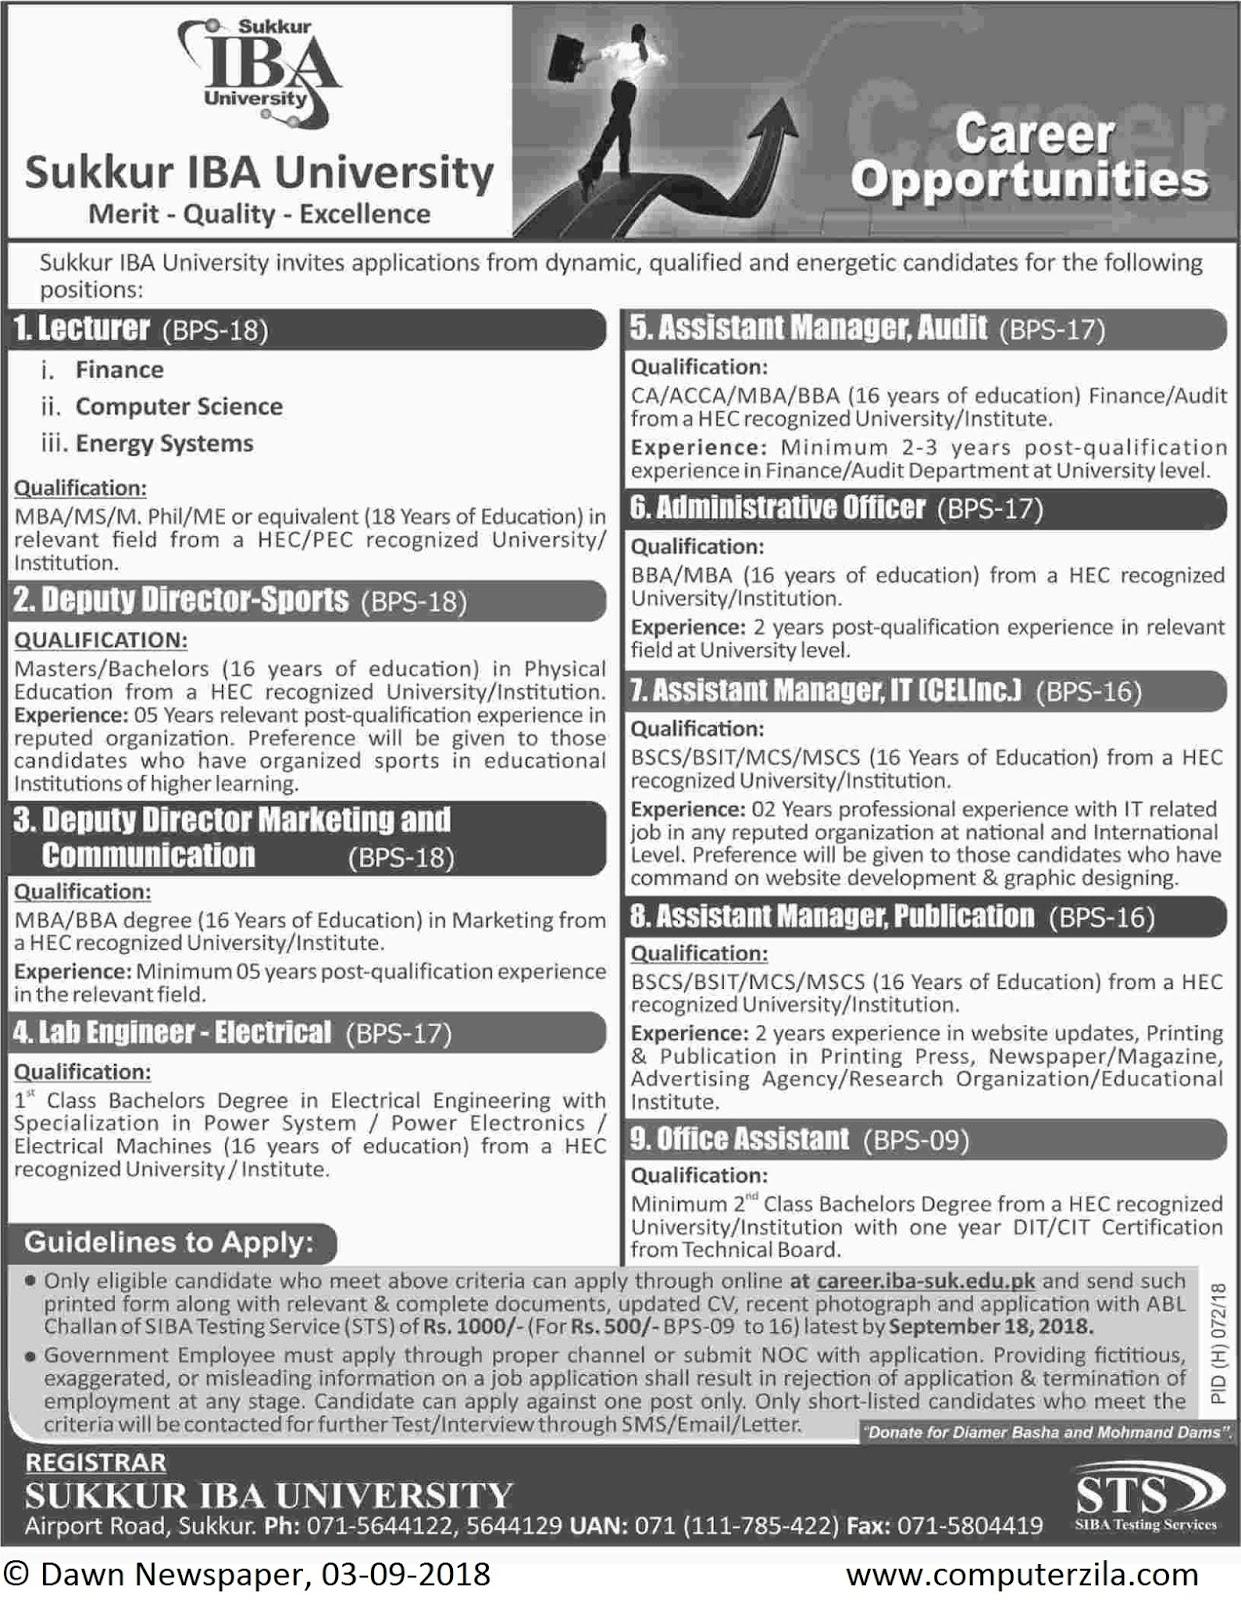 Career Opportunities at Sukkur IBA University